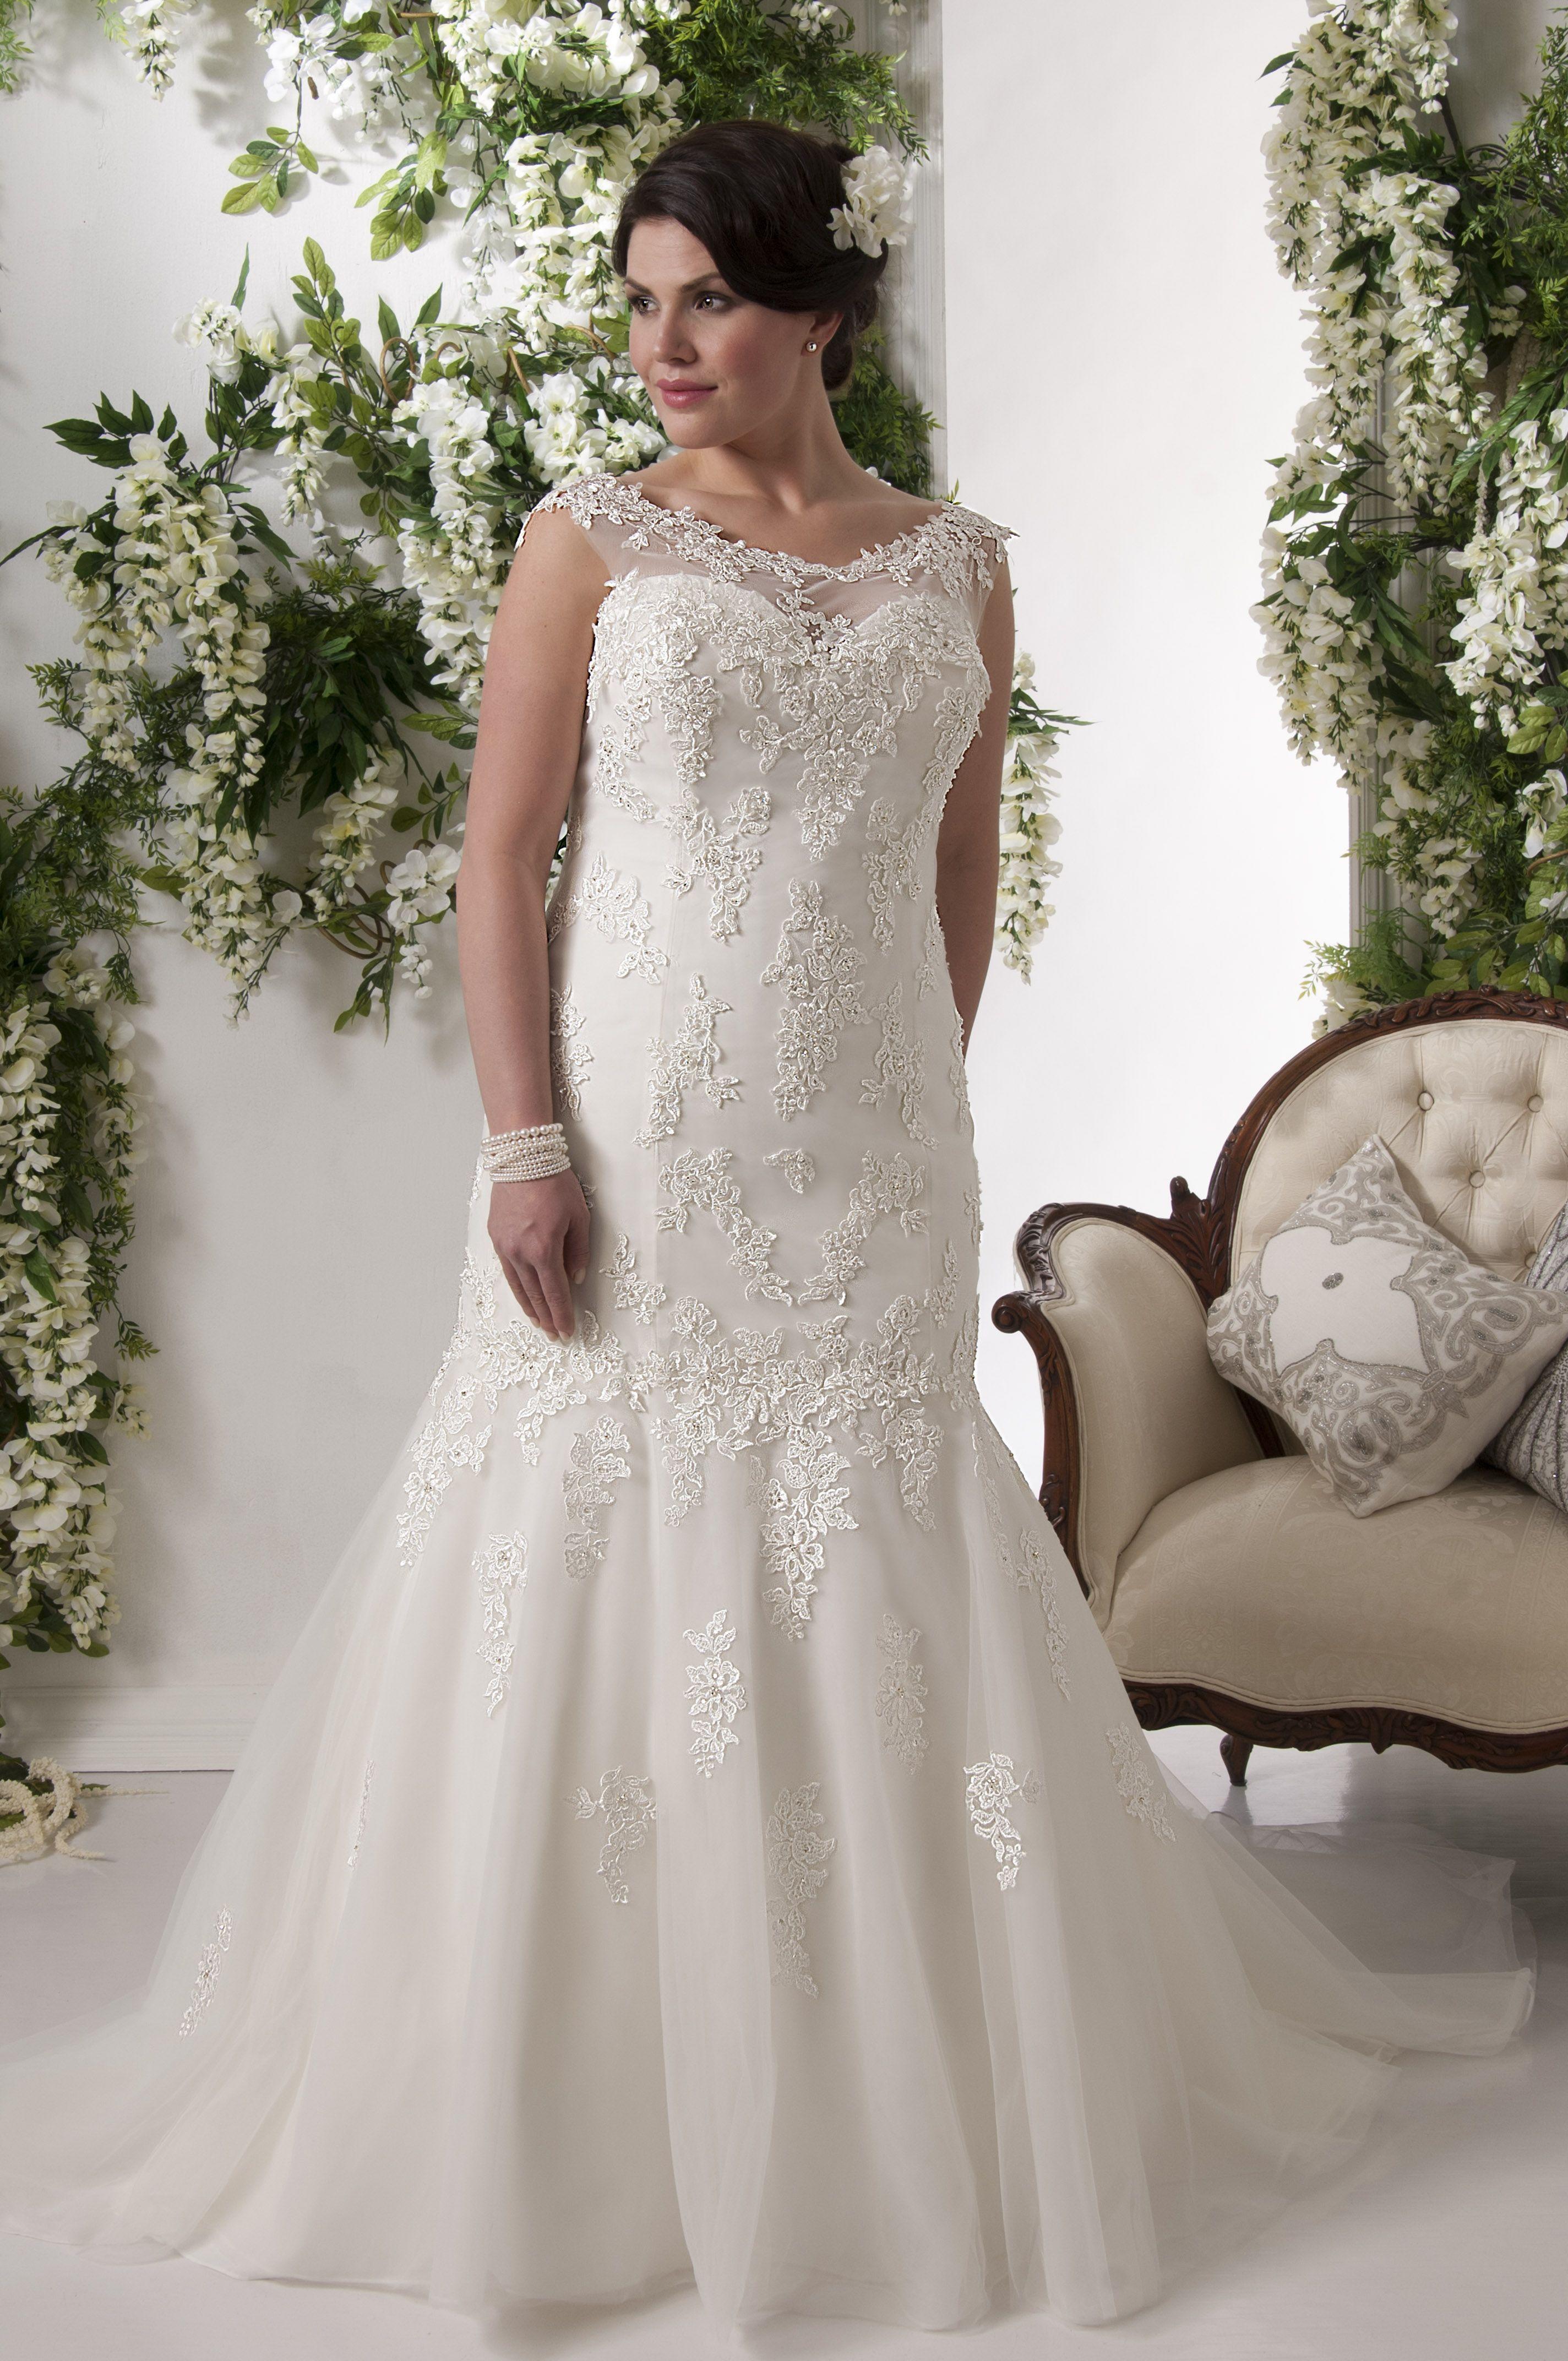 The Stunning 2016 Callista Wedding Dress Collection Bridal Gowns Mermaid Summer Wedding Dress White Bridal Gown [ 4288 x 2848 Pixel ]